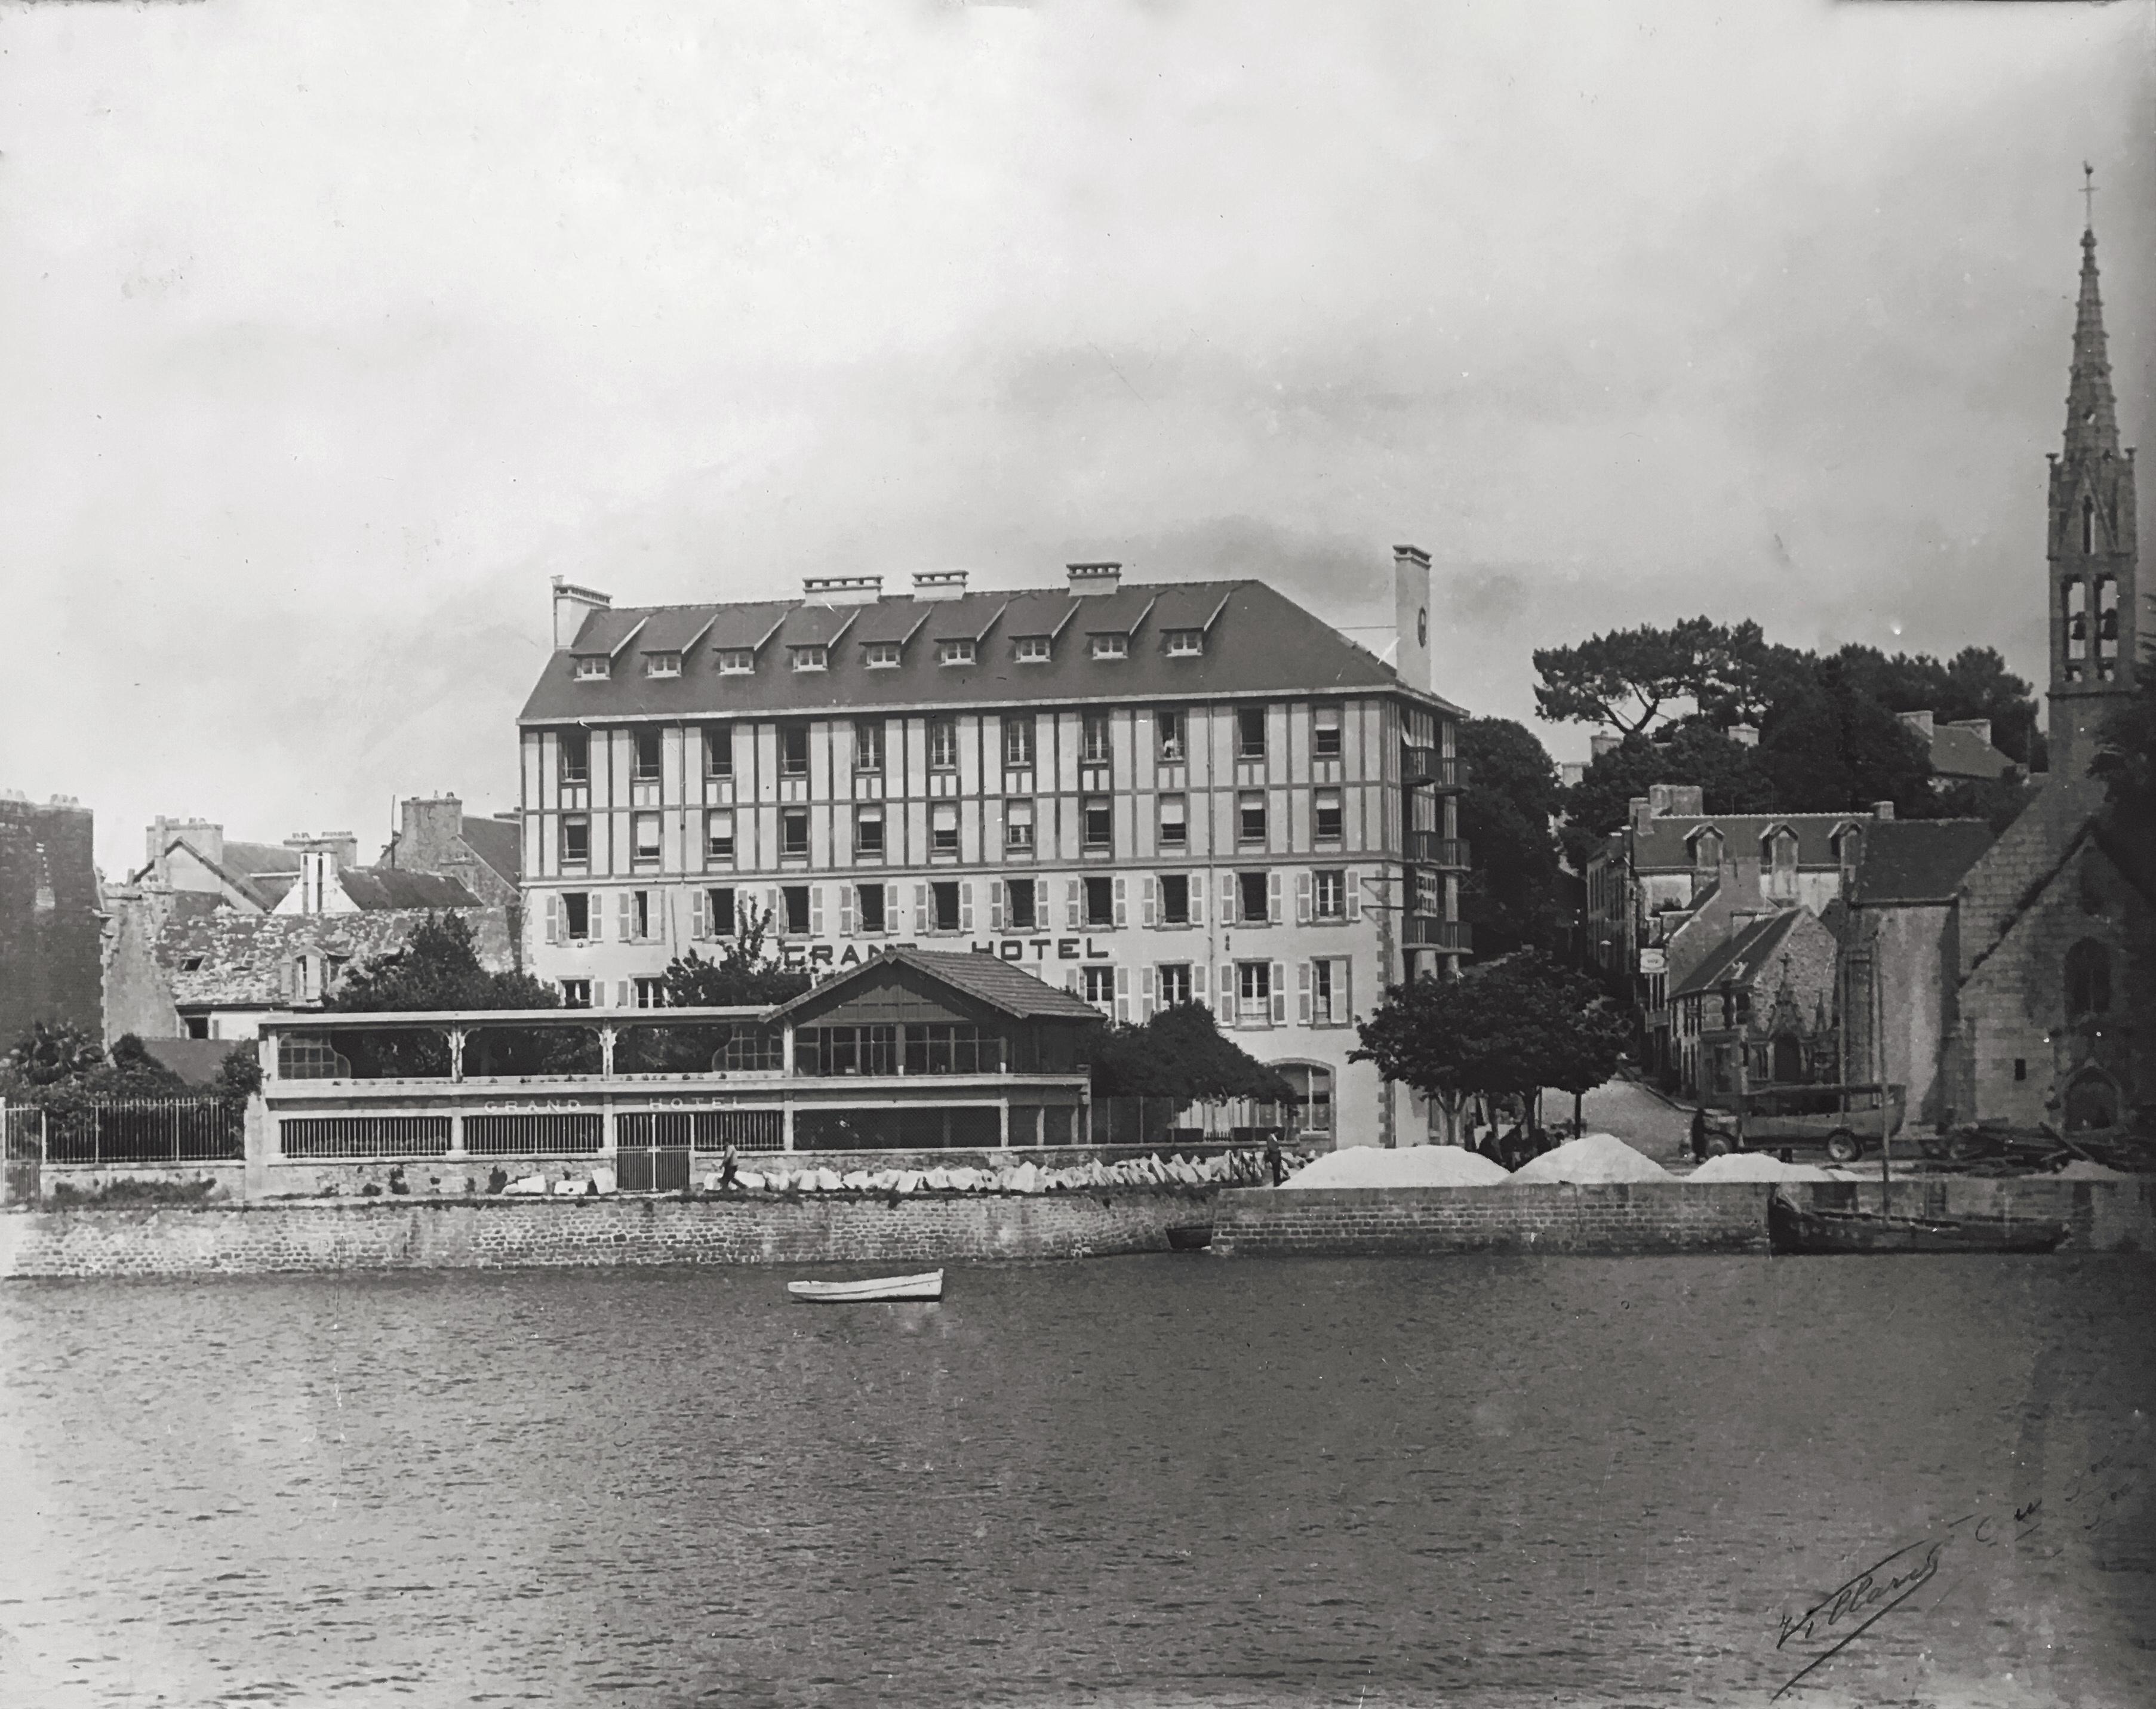 GRAND HOTEL BENODET